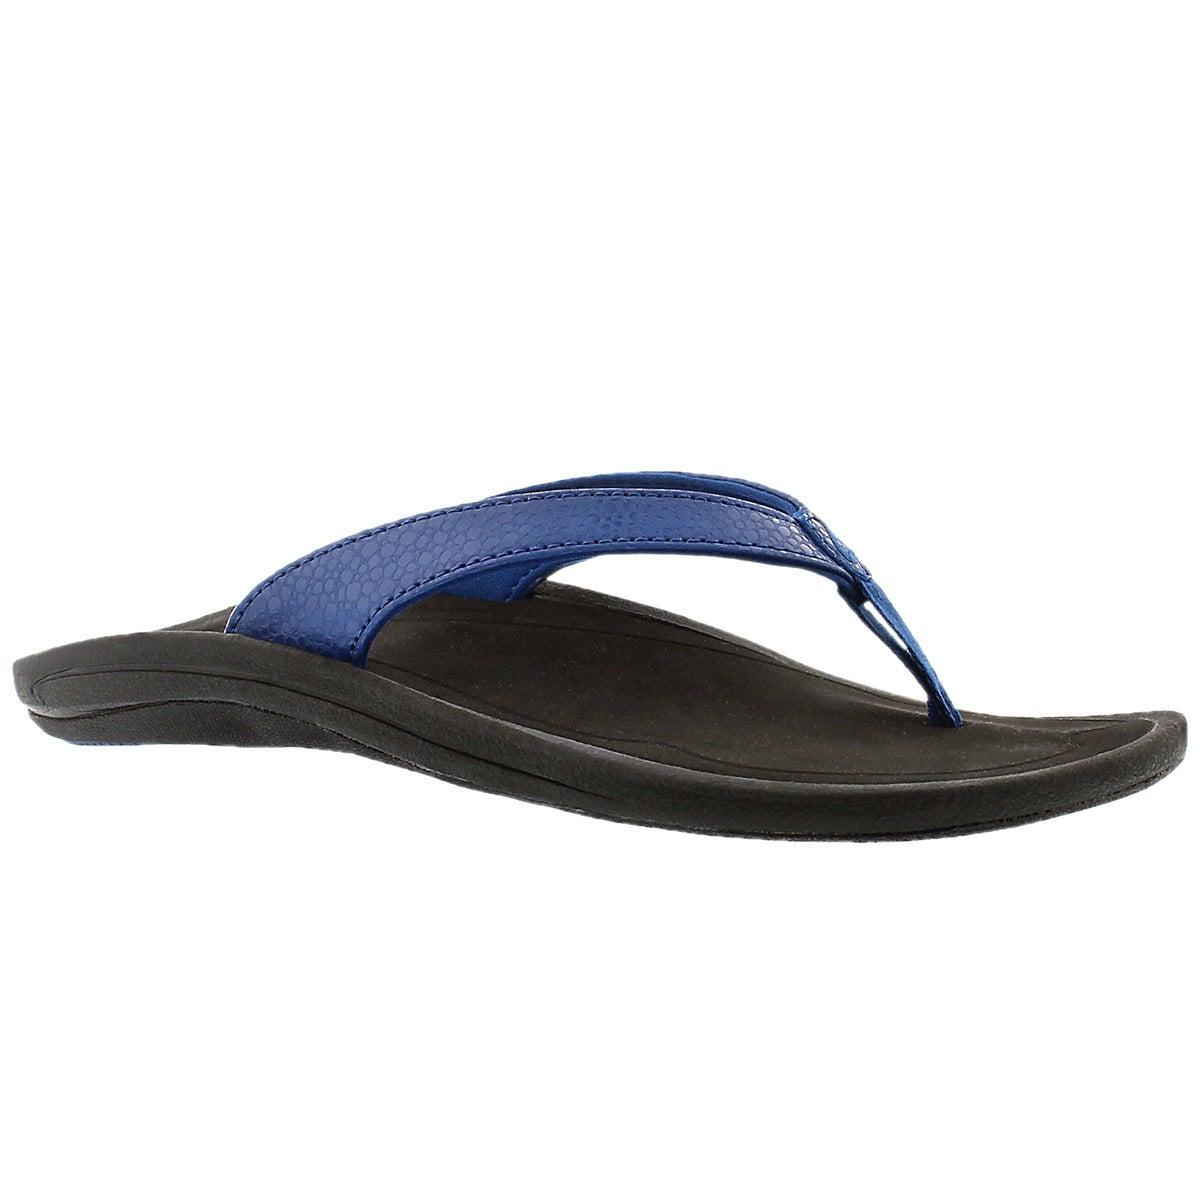 Sandale tong KULAPA KAI, bleu, femmes